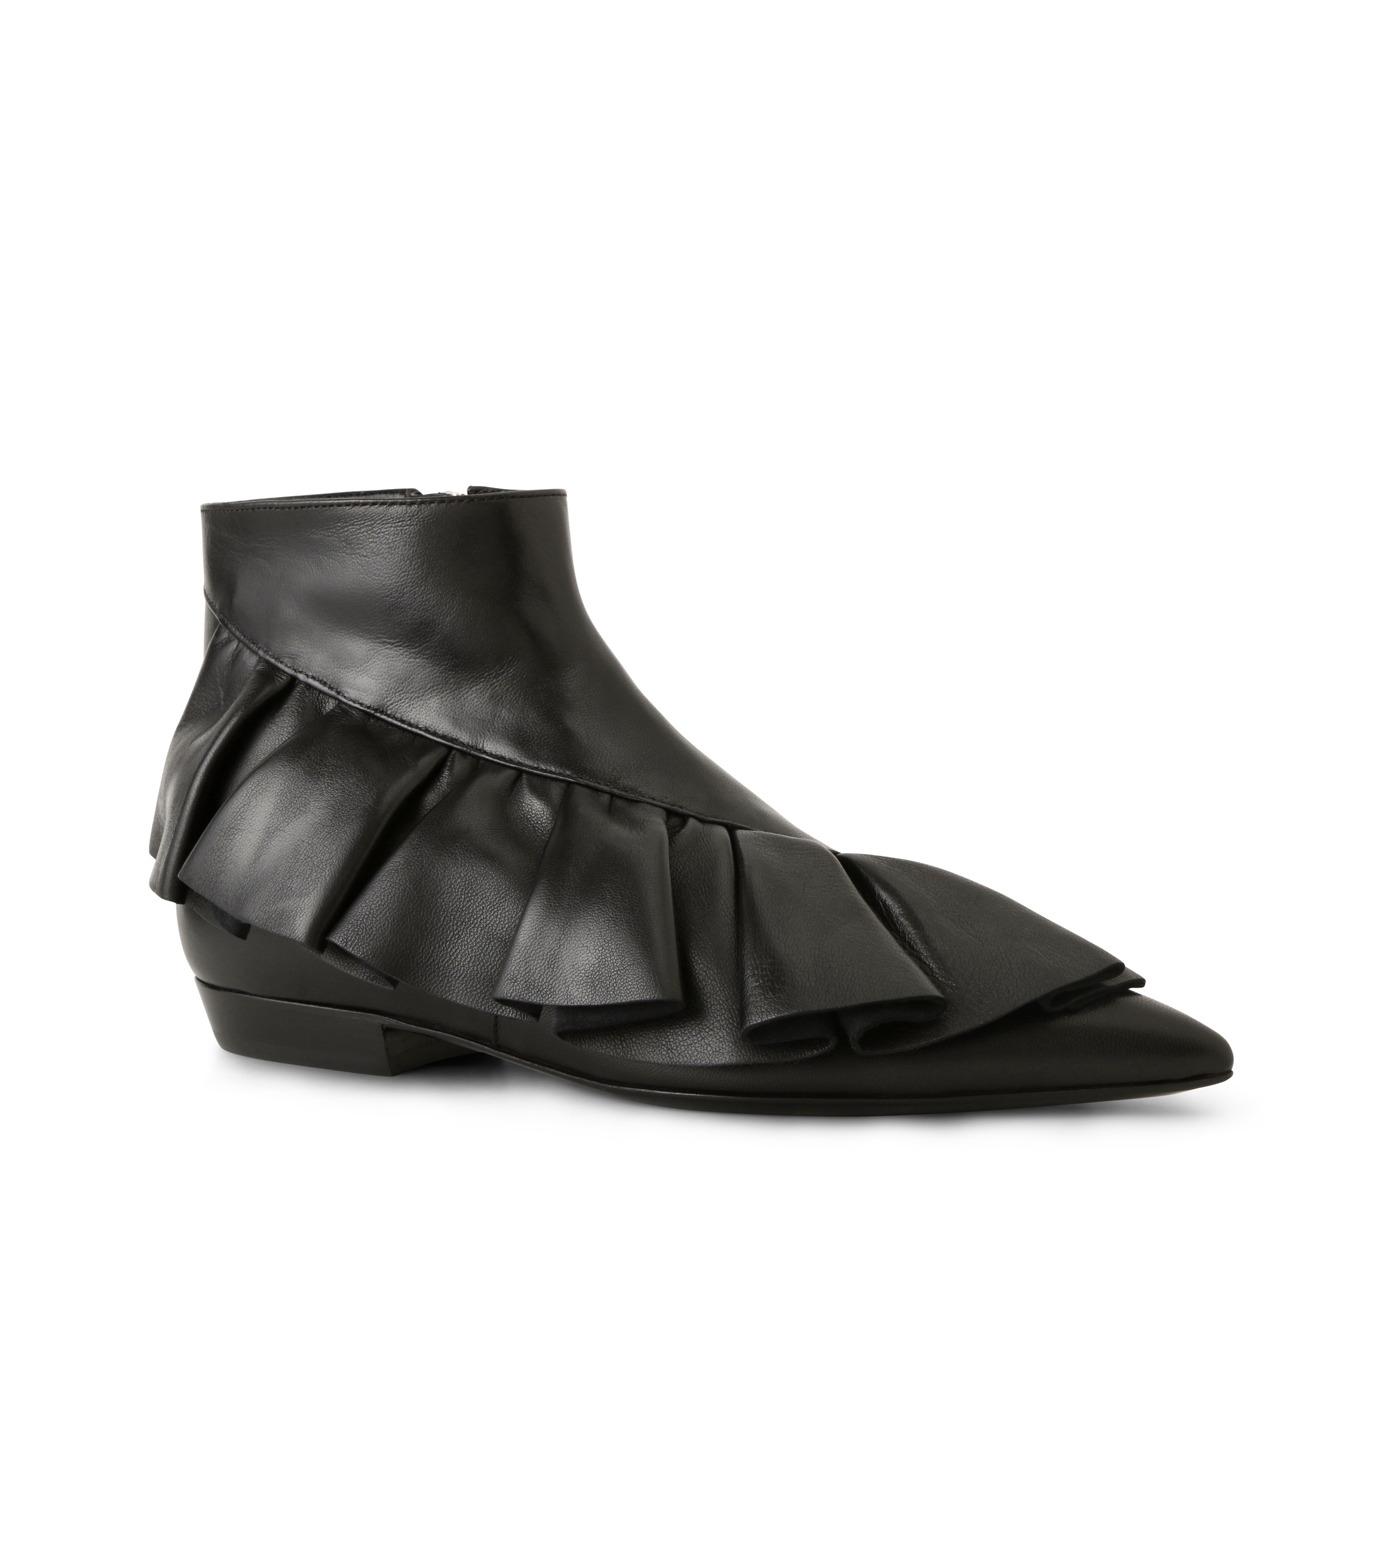 J.W.Anderson(ジェイダブリュー アンダーソン)のRuffle Bootie-BLACK(ブーツ/boots)-JWAFW01C-13 拡大詳細画像1